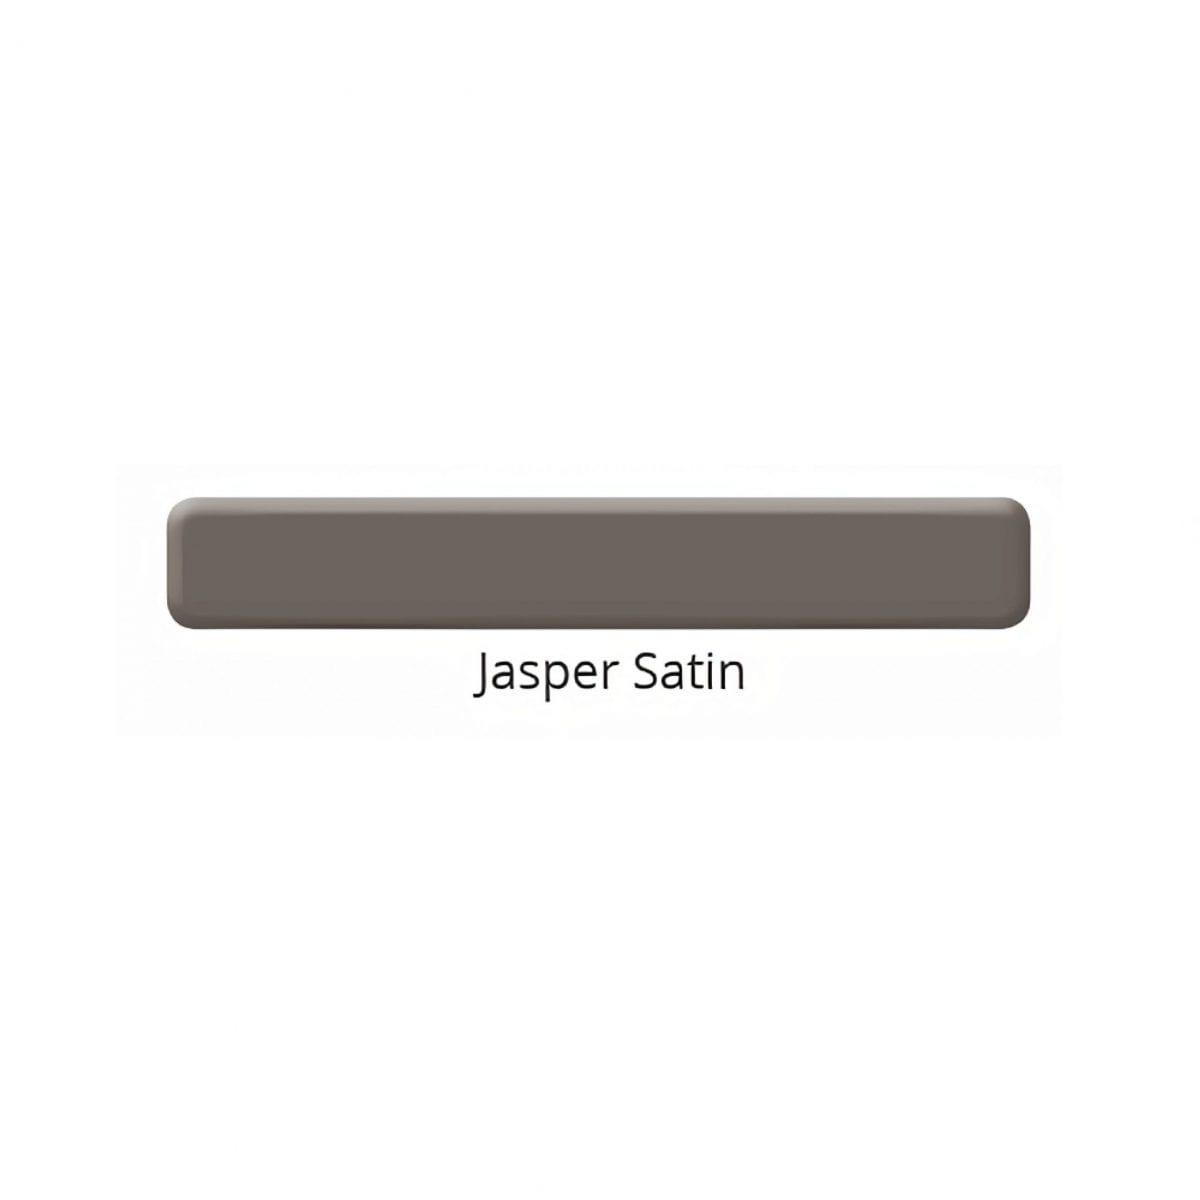 Jasper Satin color